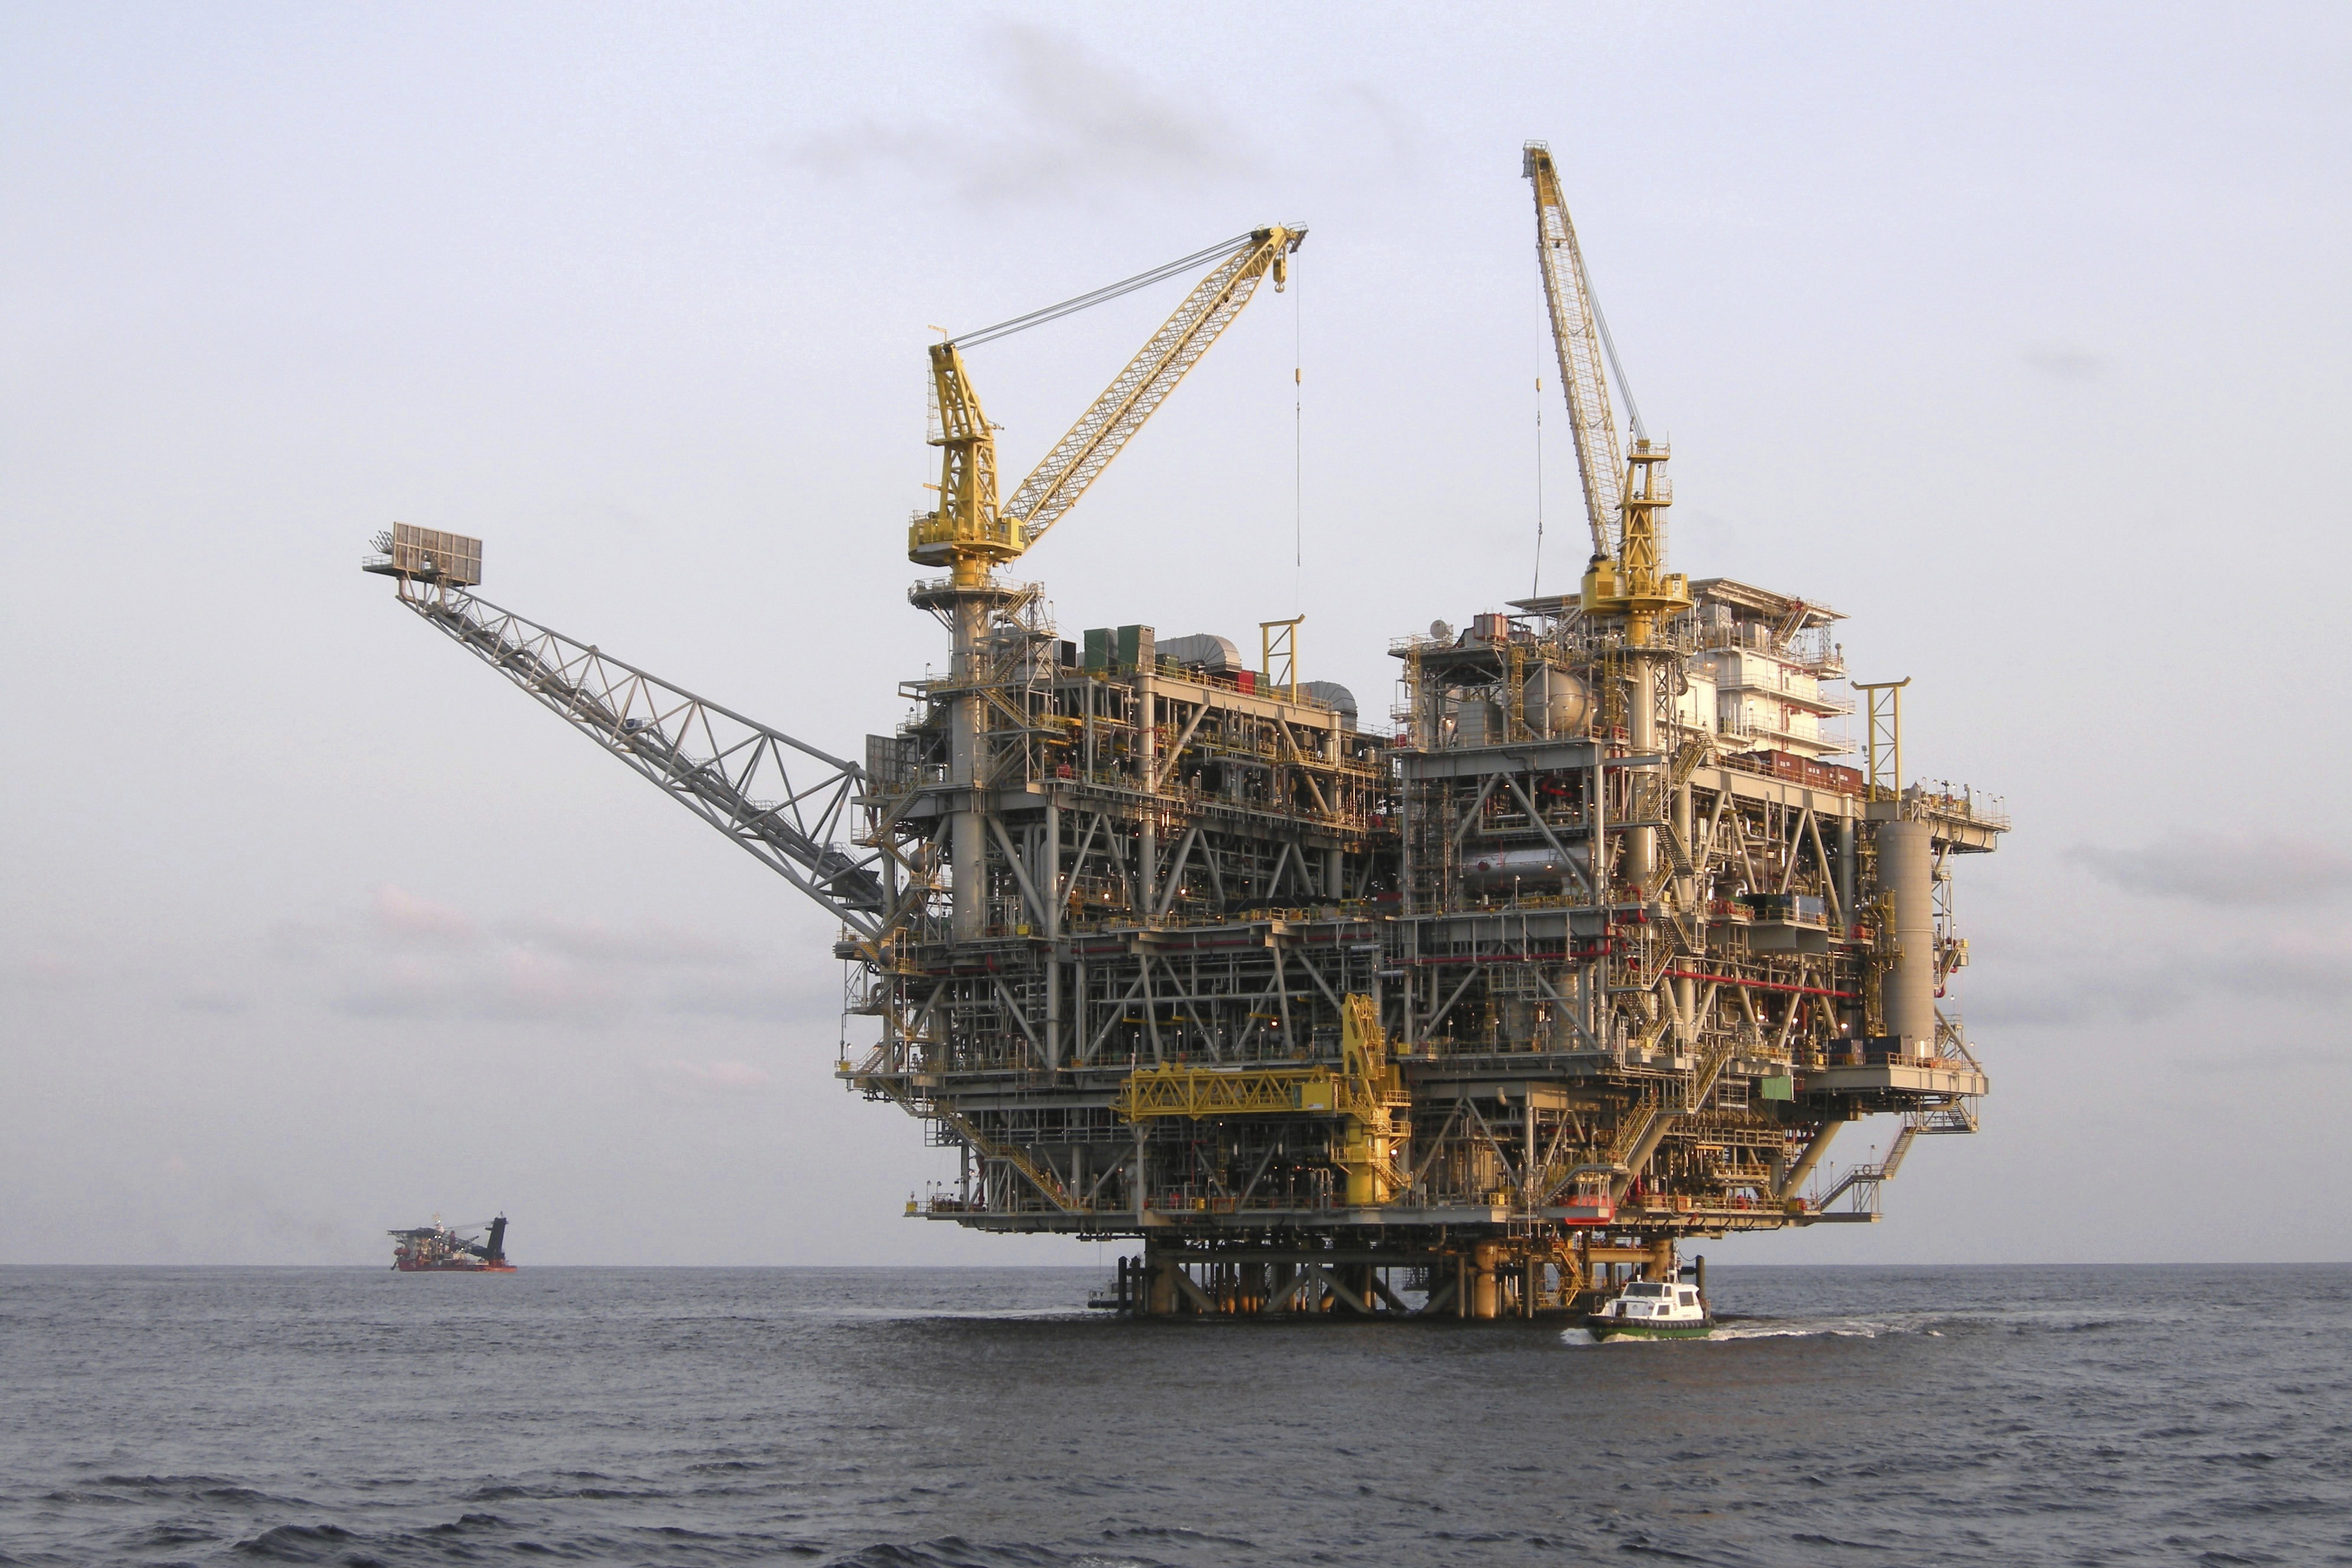 Oil Platform offshore | Global Trade Review (GTR)